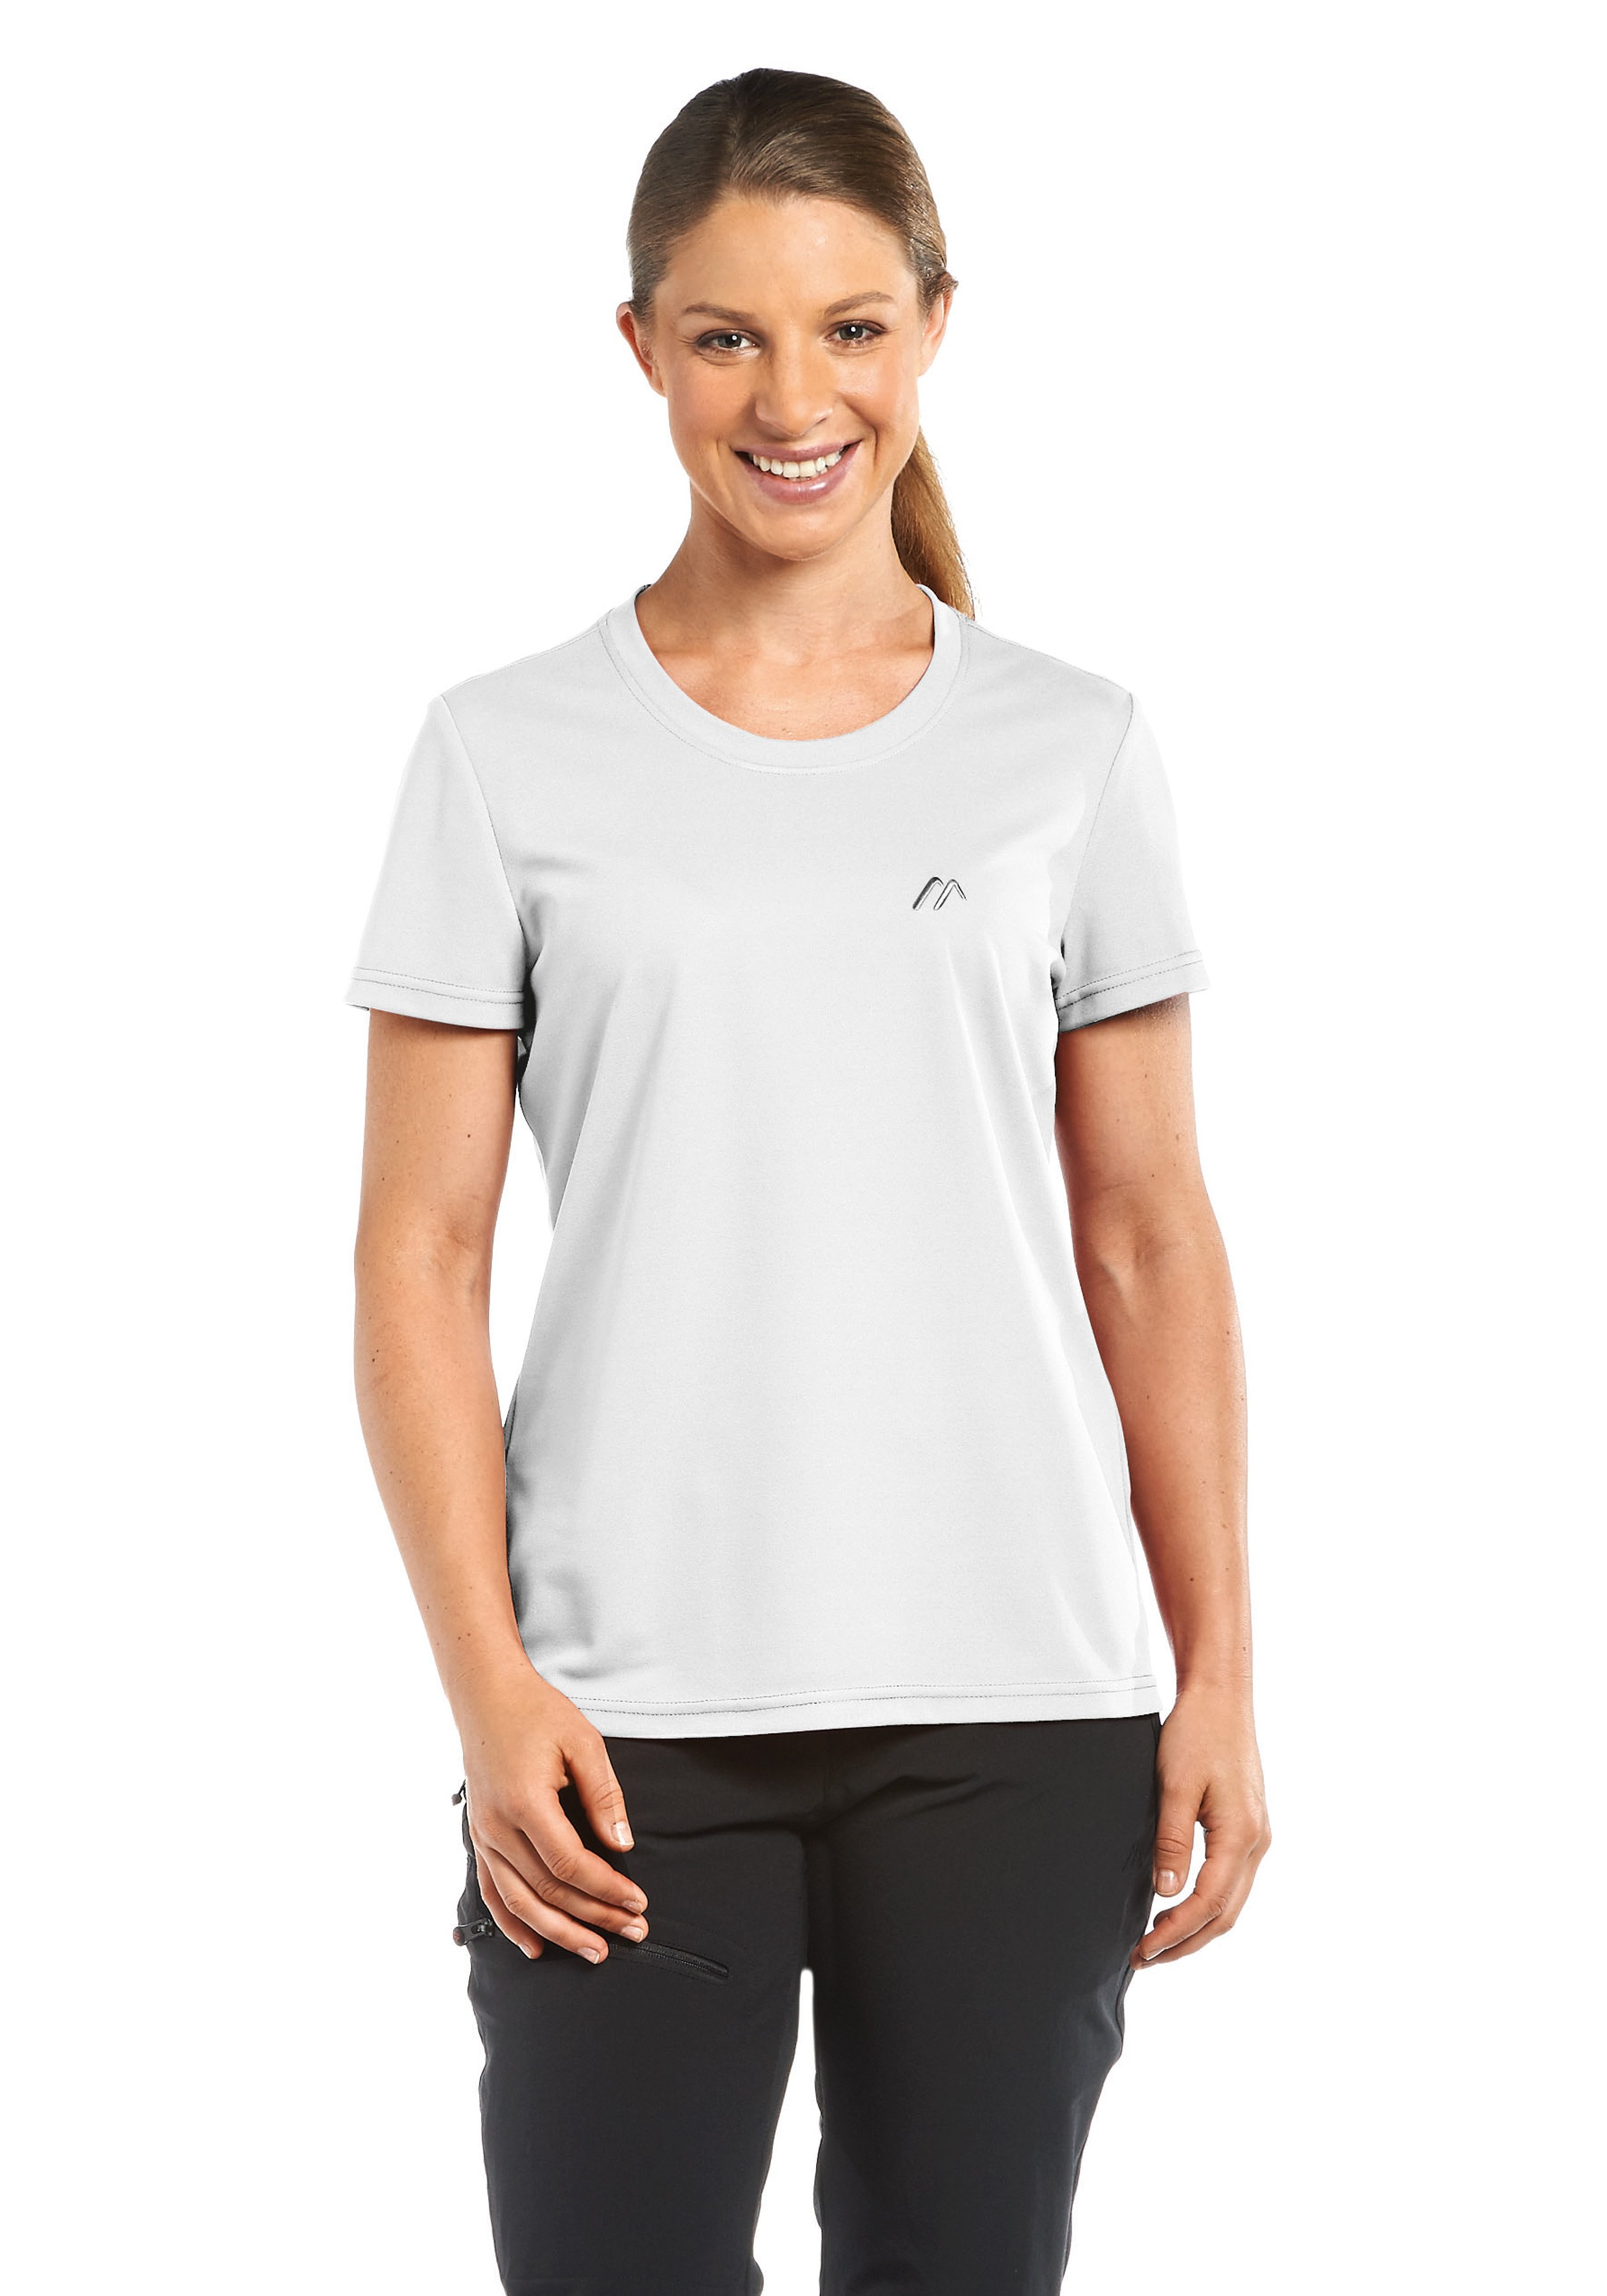 Maier Sports Funktionsshirt Waltraud   Bekleidung > Shirts > Funktionsshirts   Weiß   Maier Sports